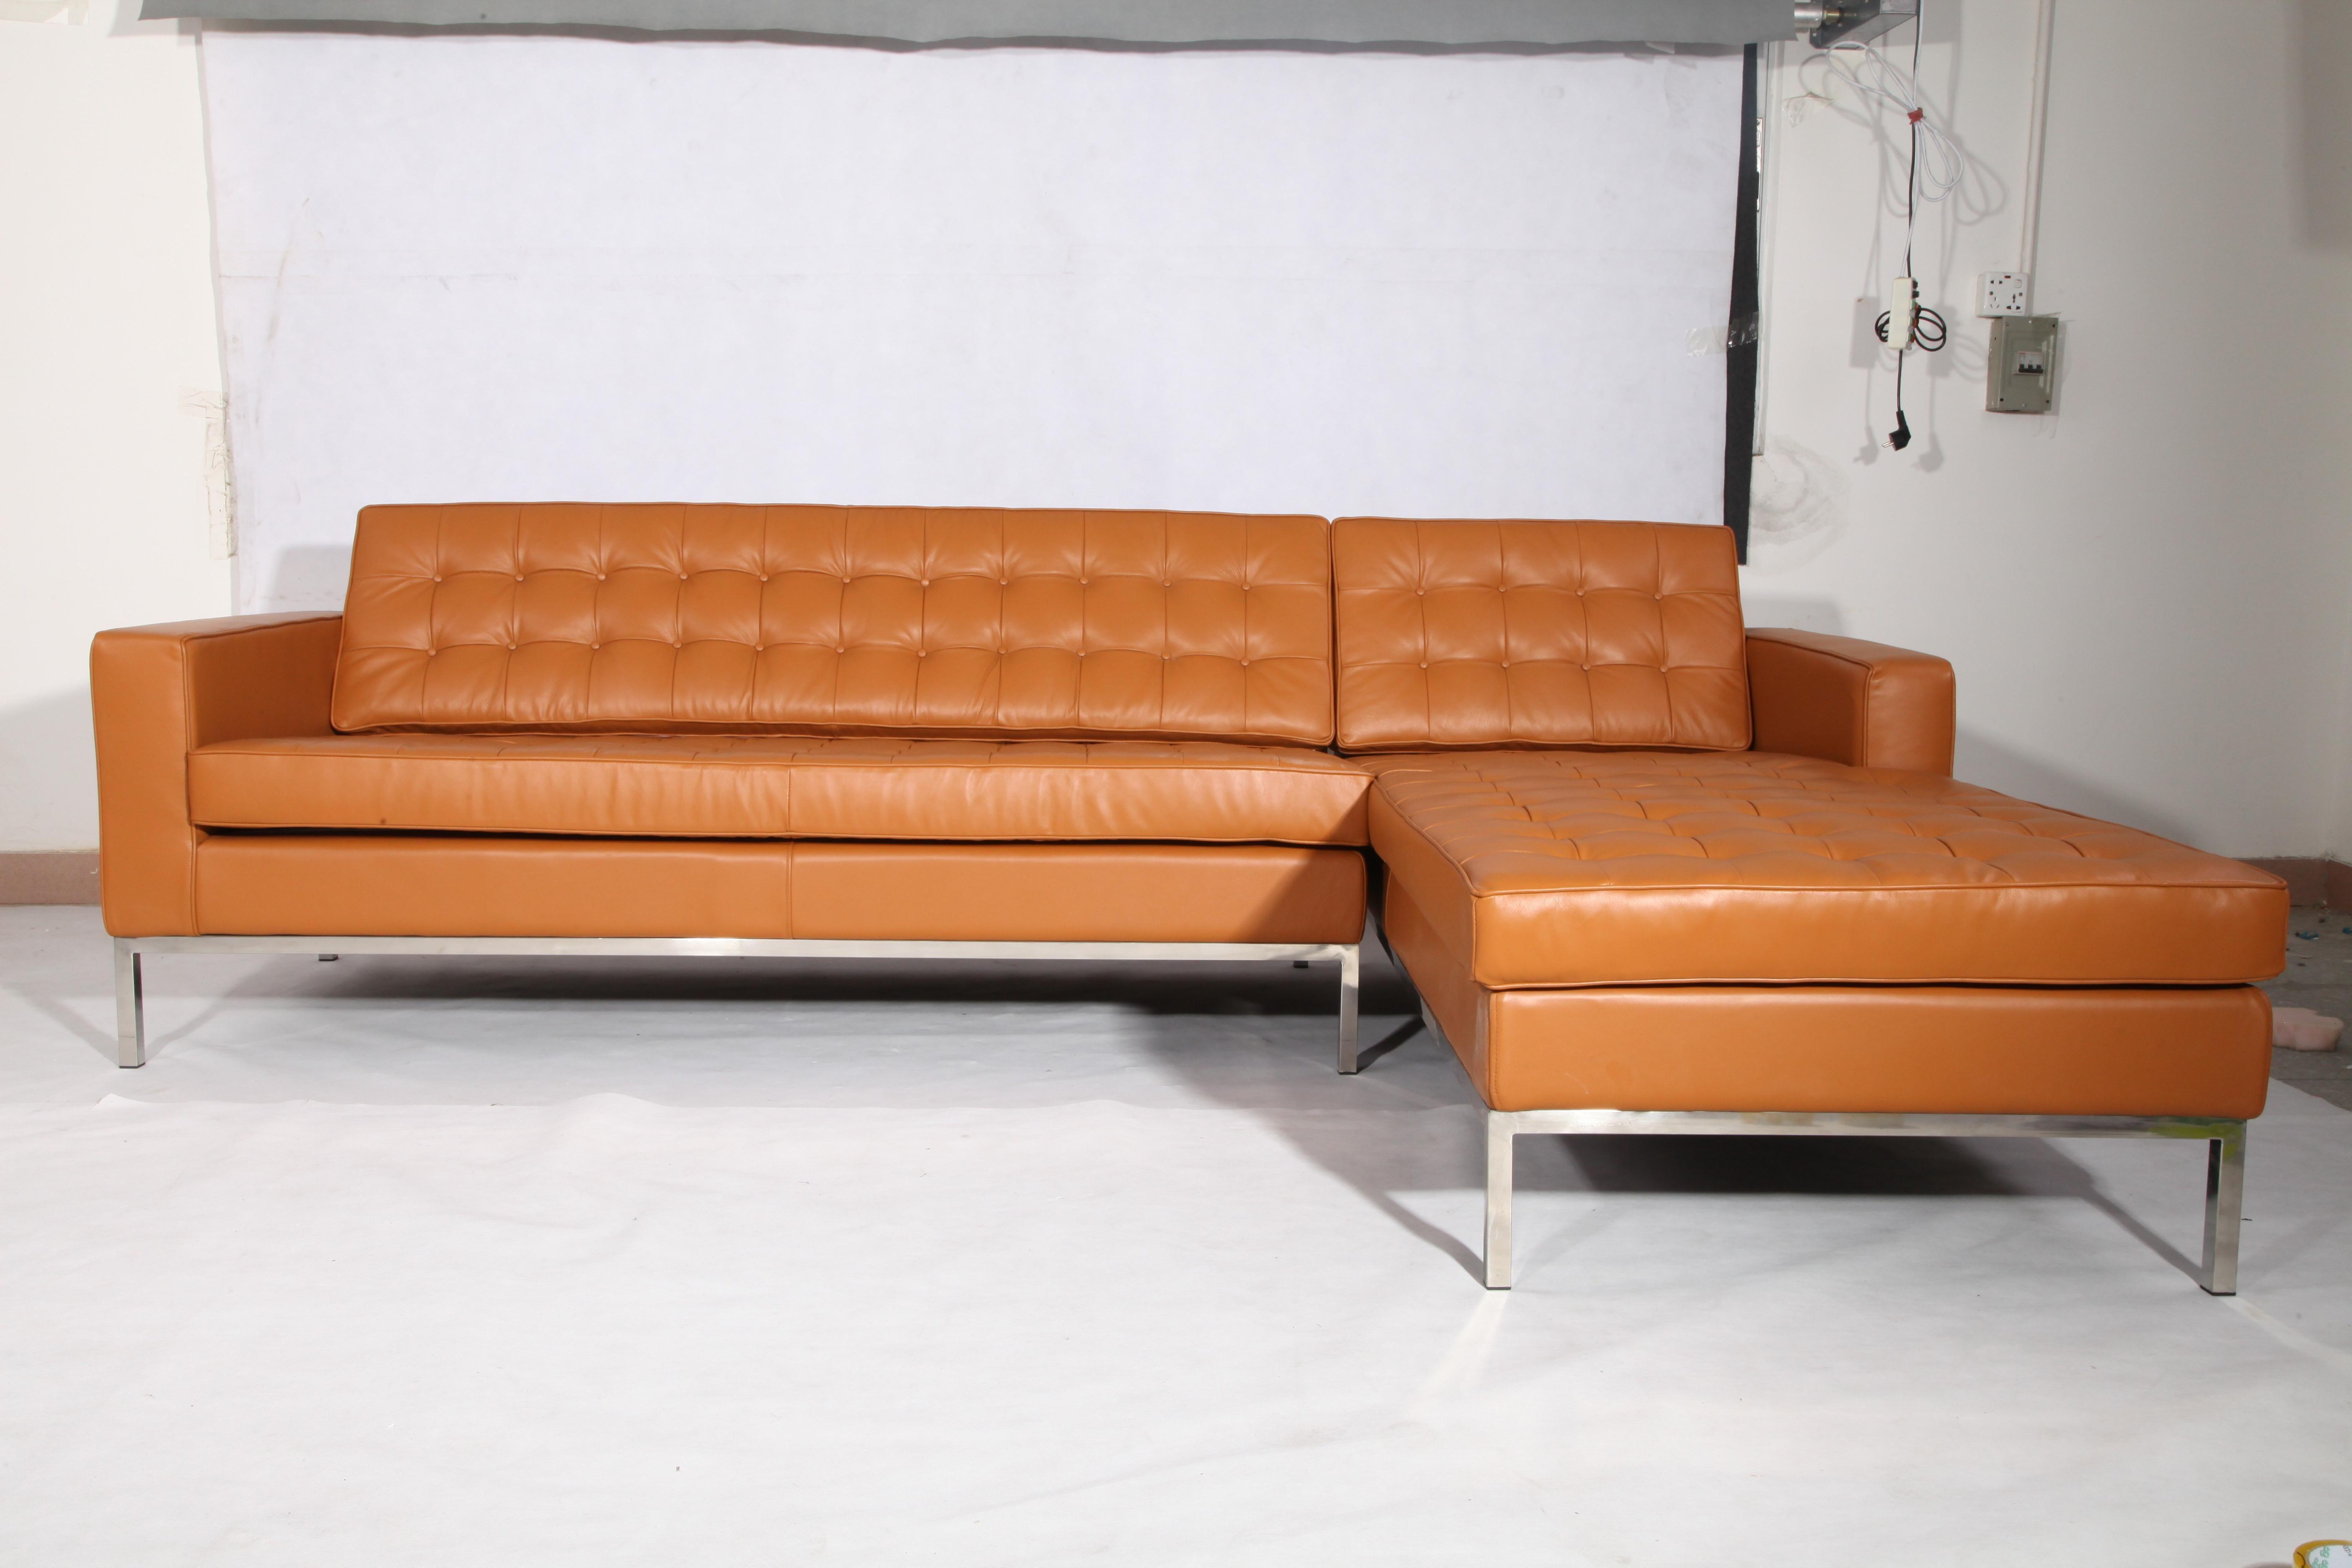 Florence Knoll Sofa Review Beautiful Wood Design Corner Replica Home Co